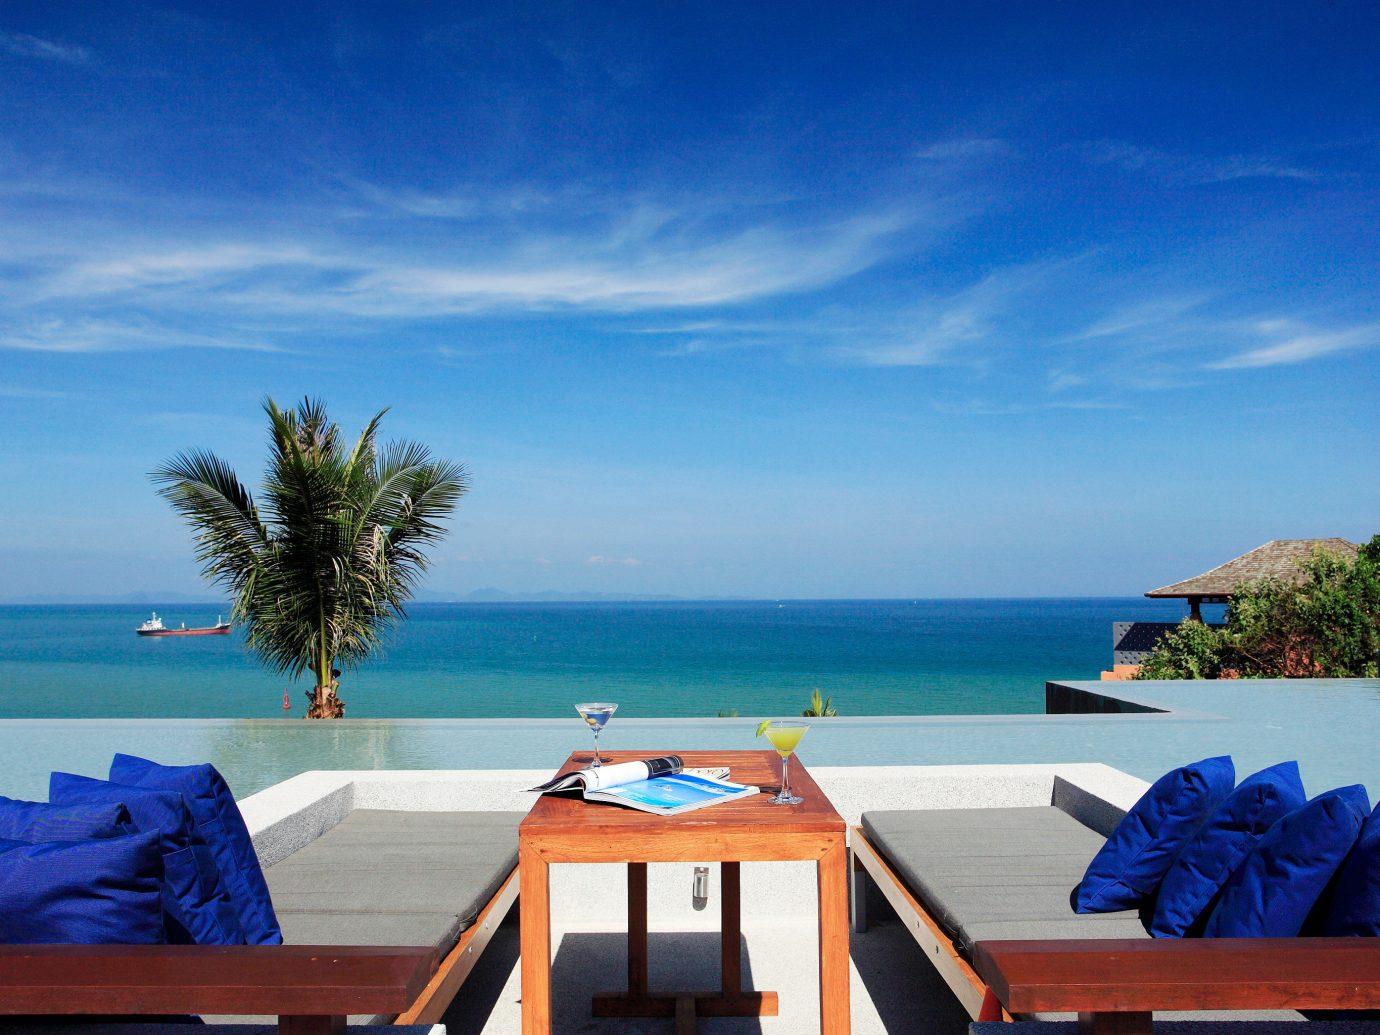 Beach Beachfront Exterior Hotels Ocean Resort sky water leisure outdoor vacation Sea caribbean swimming pool Nature estate bay Villa overlooking Deck shore Island